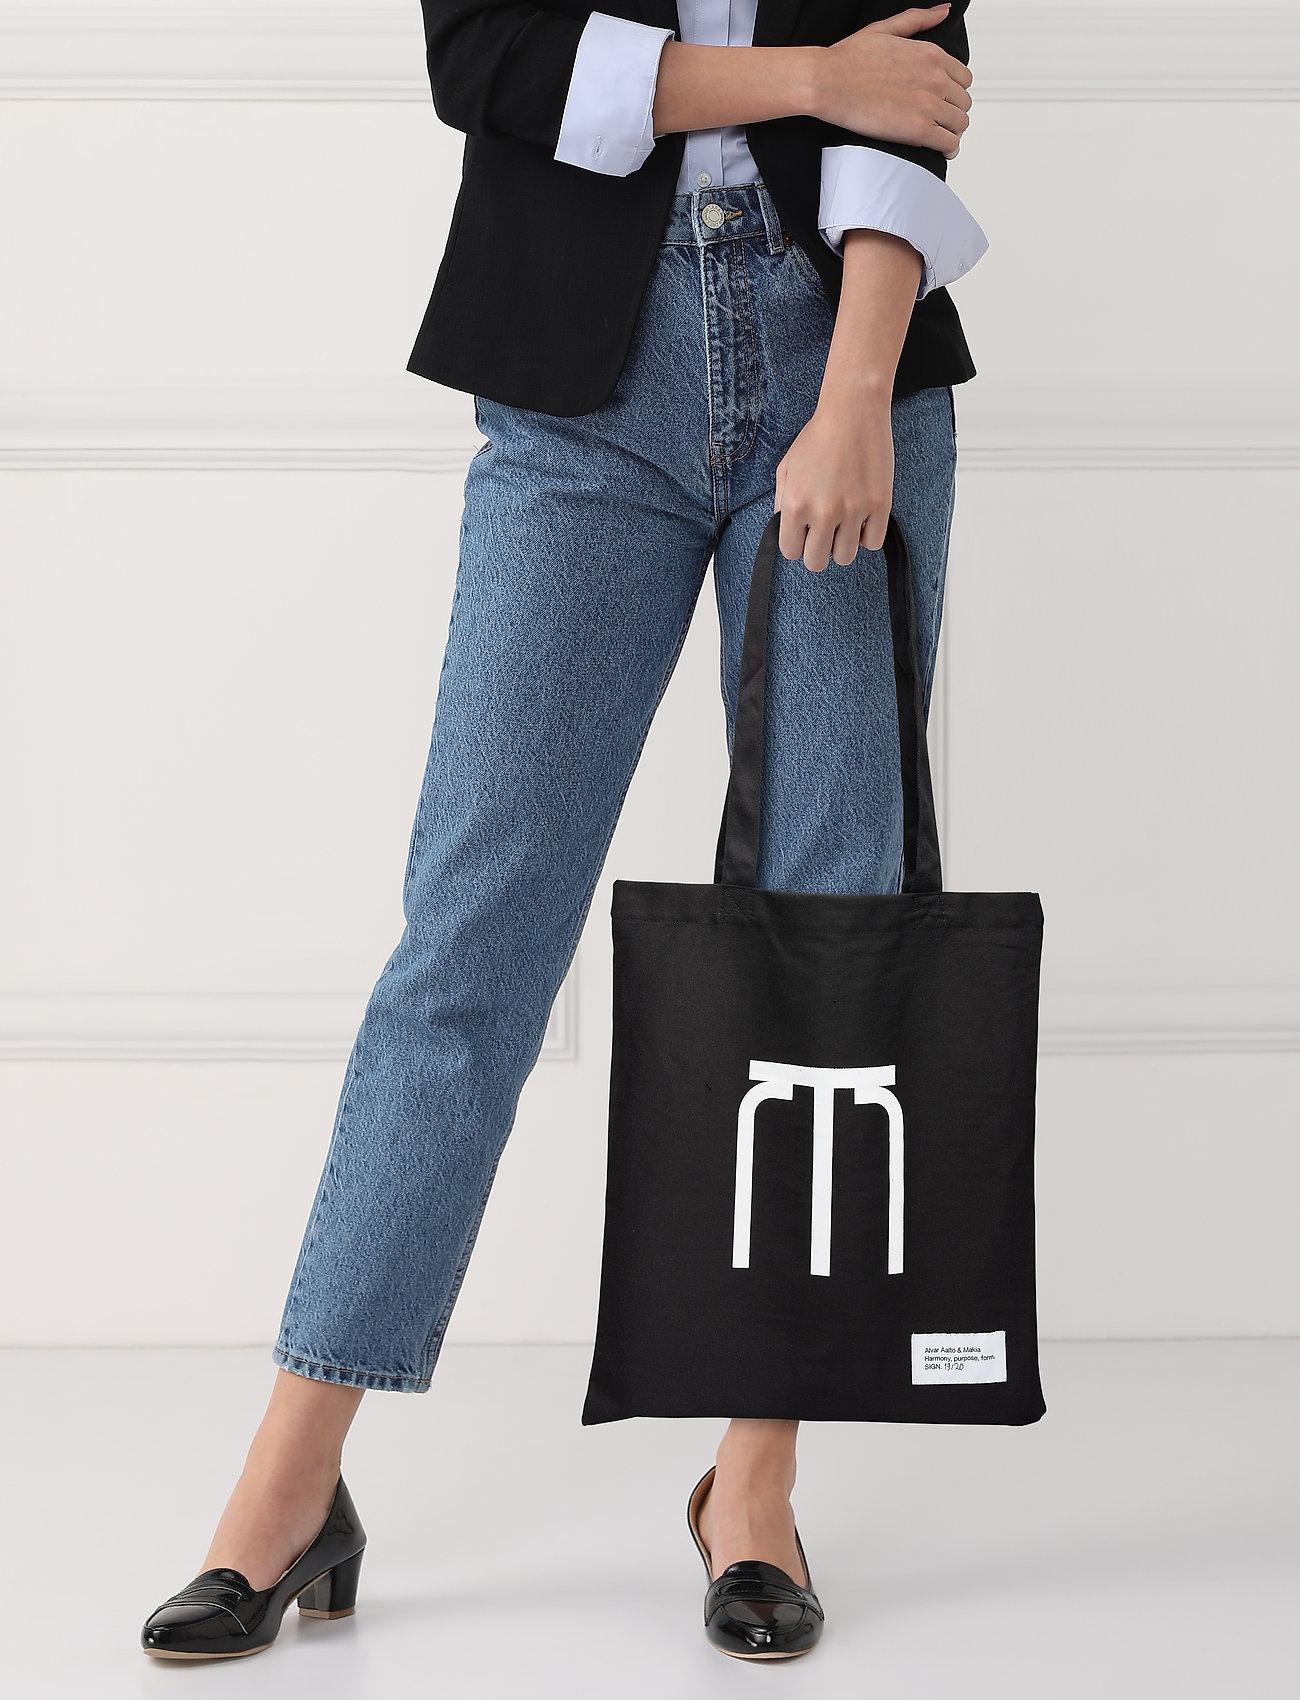 Makia Stool Tote Bag - BLACK